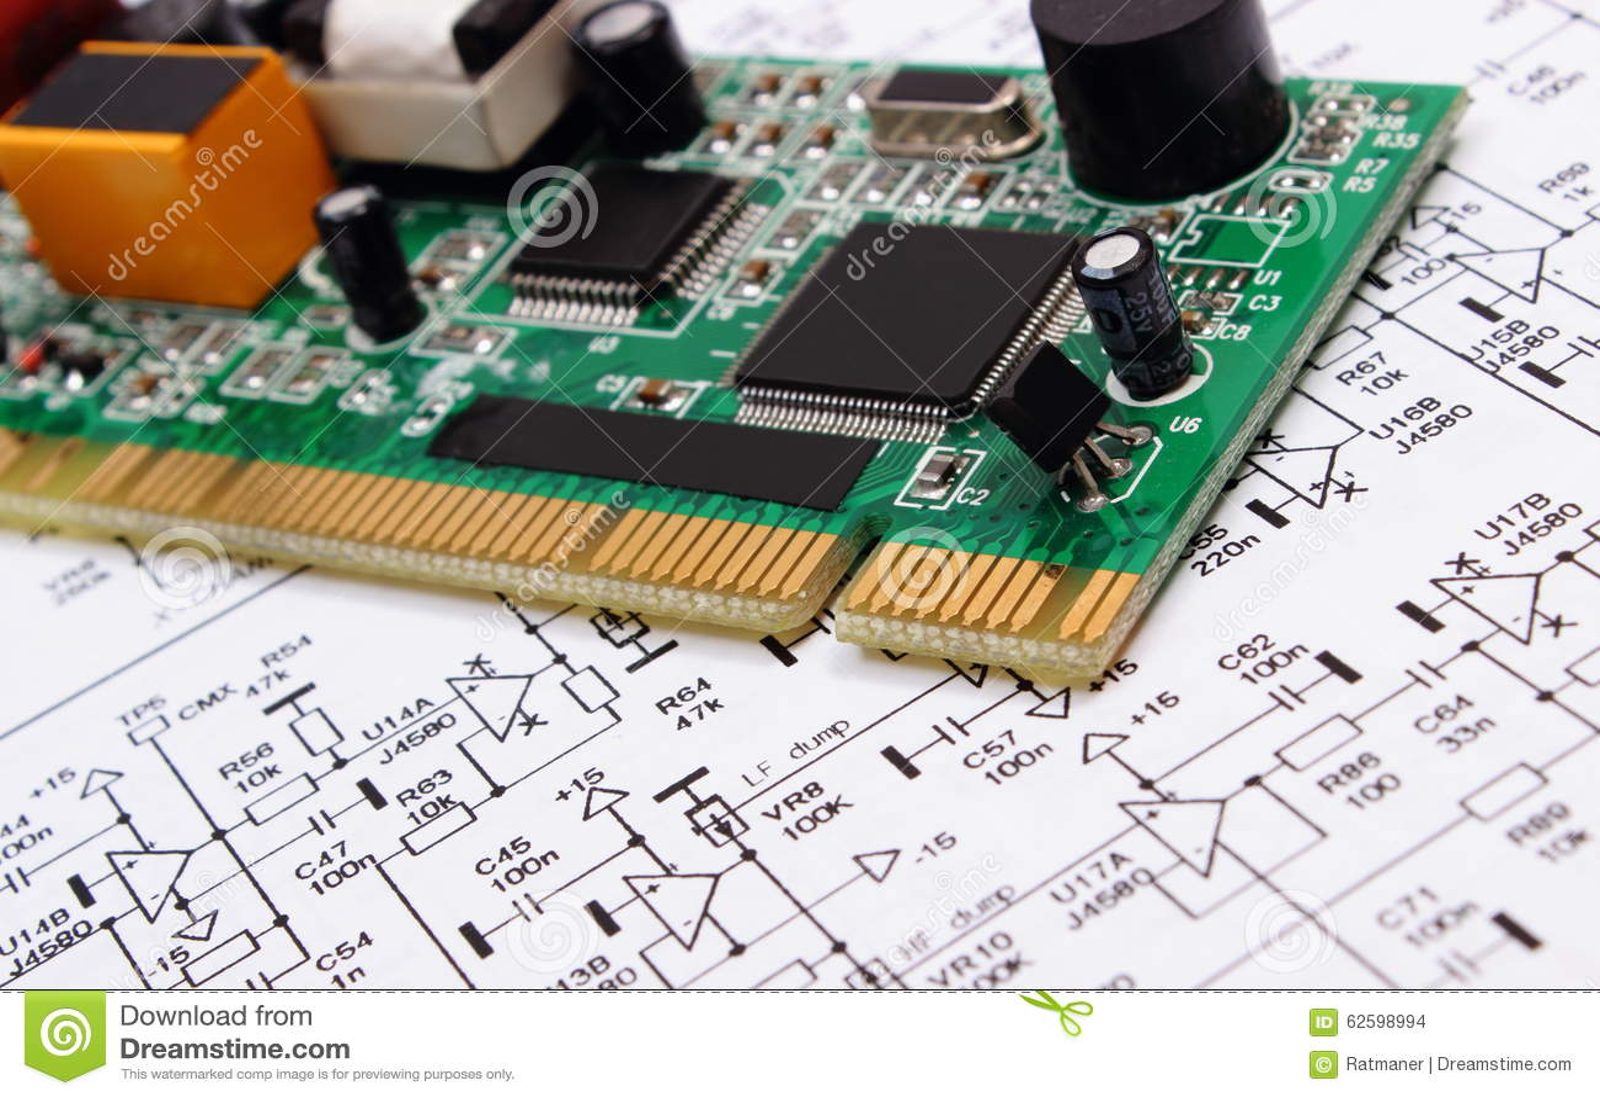 Printed Circuit Board Lying On Diagram Of Electronics